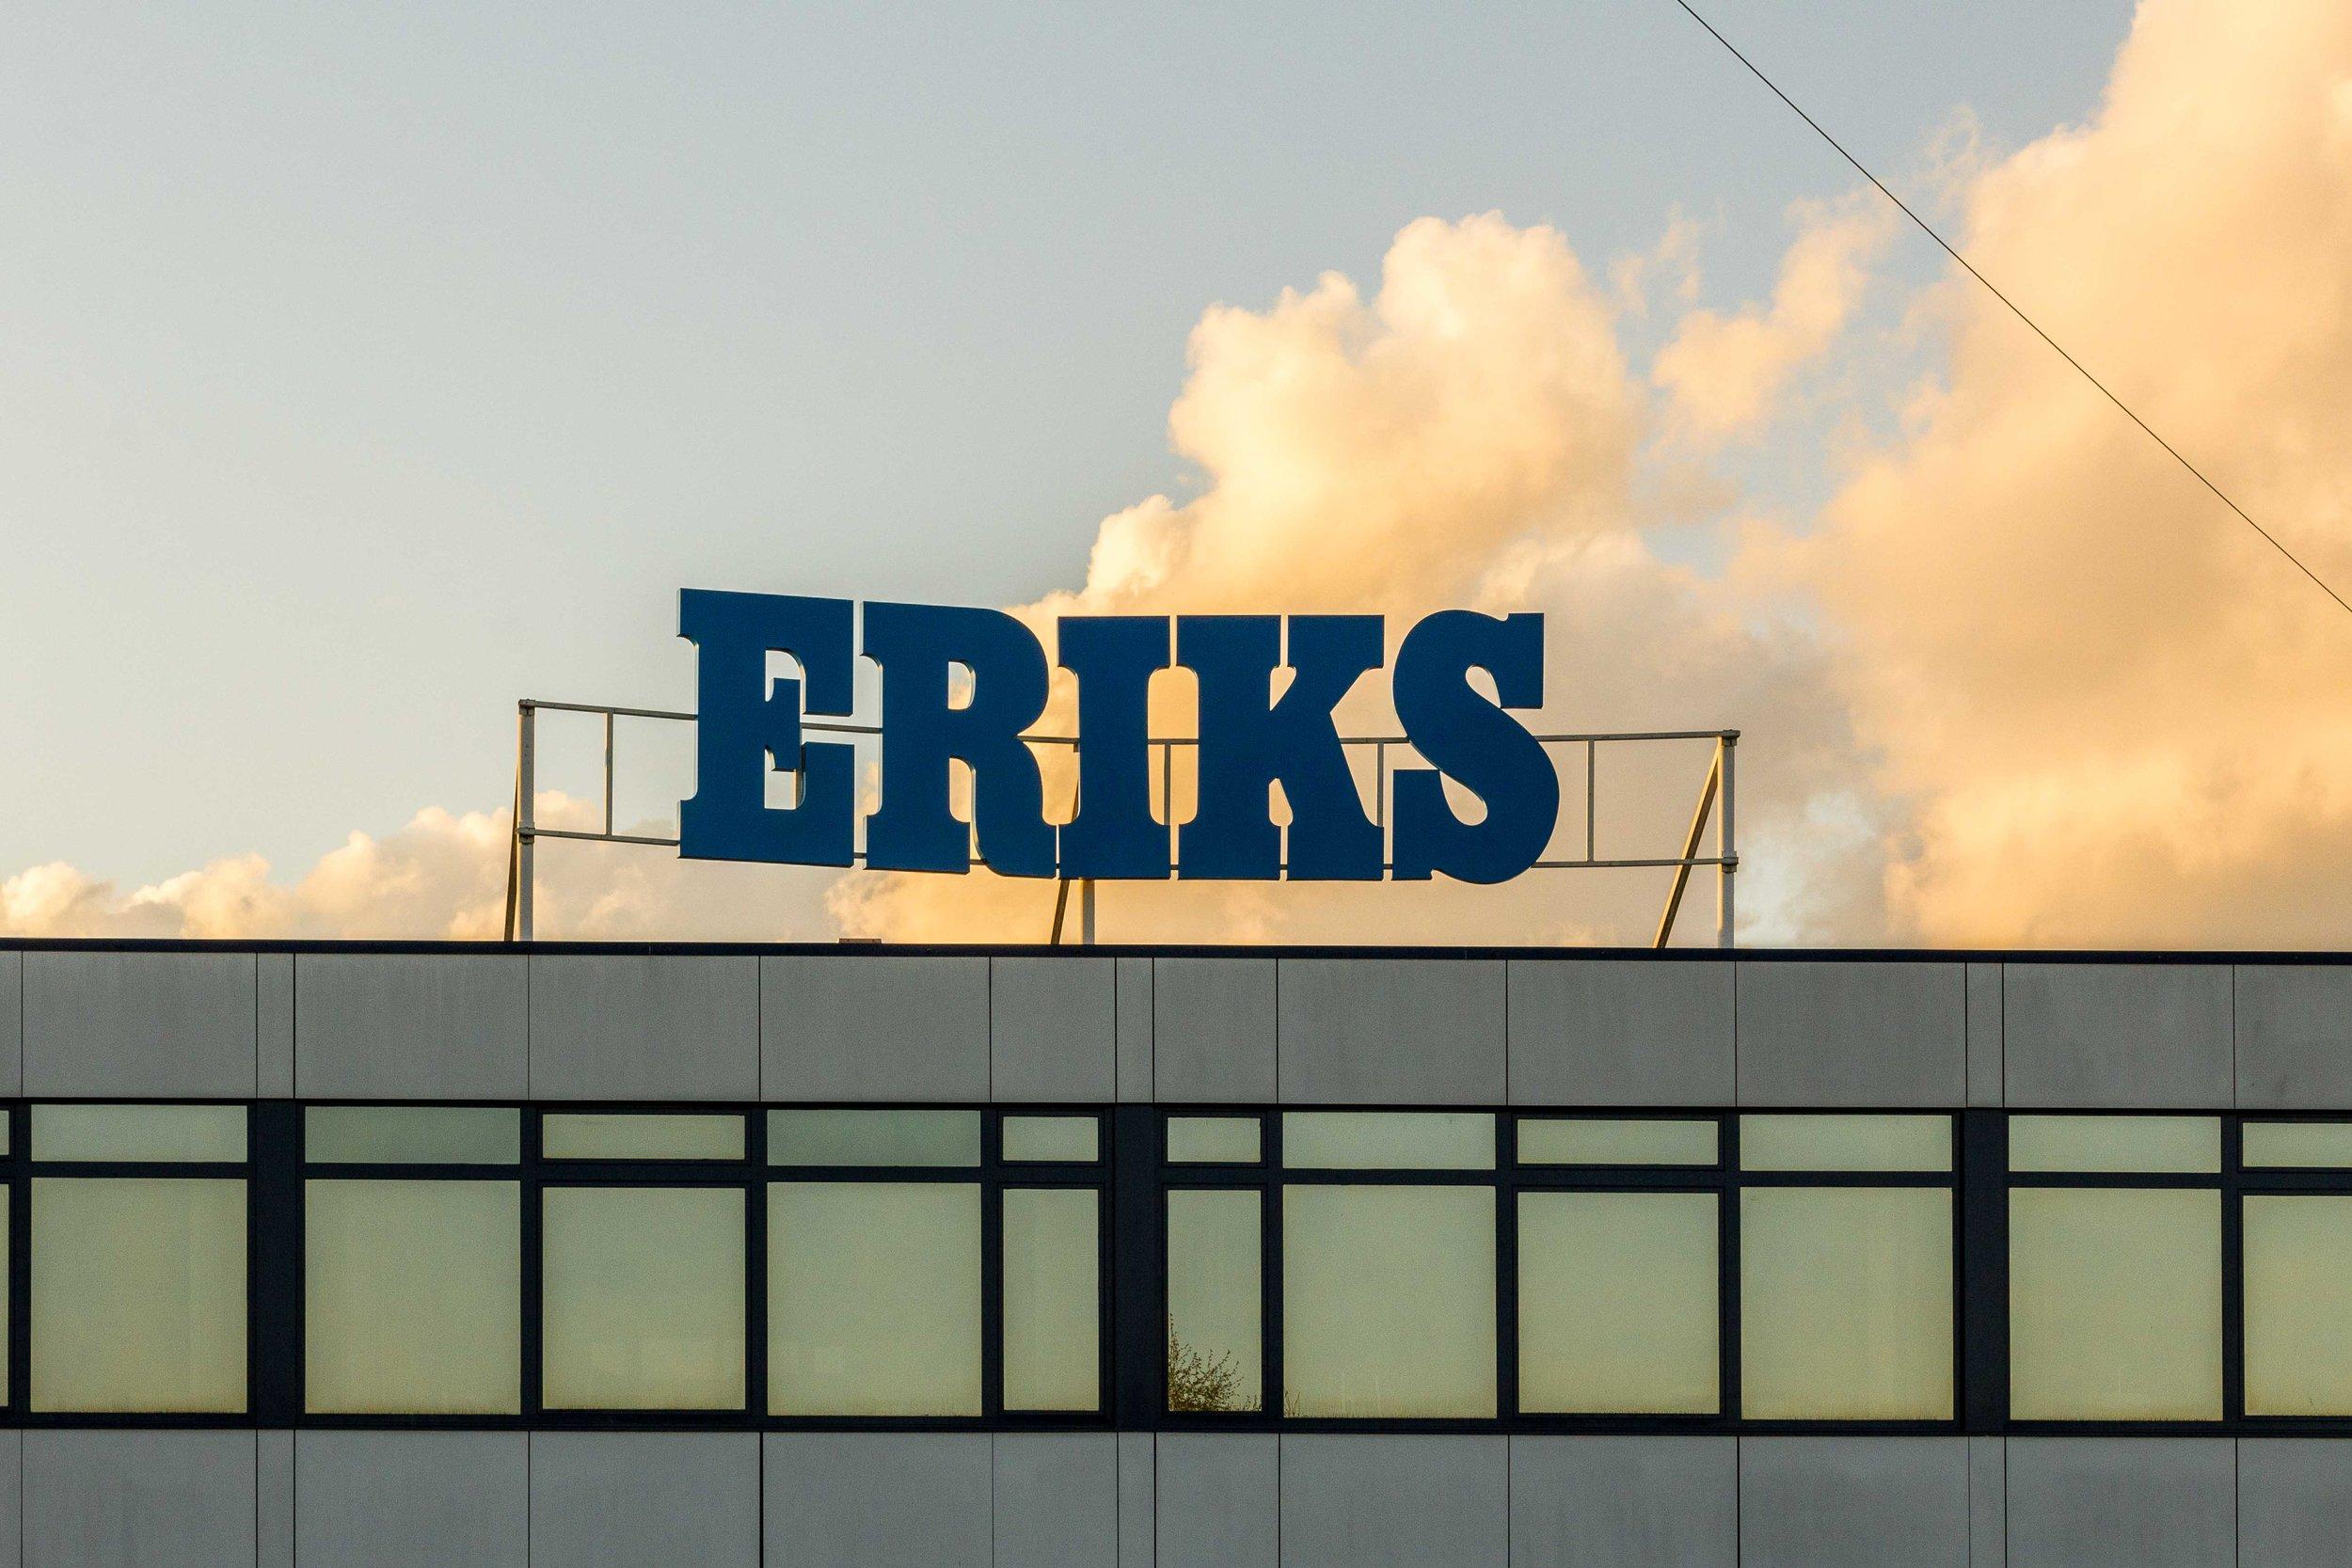 Eriks-Mol-Alexis-Breugelmans-015.jpg